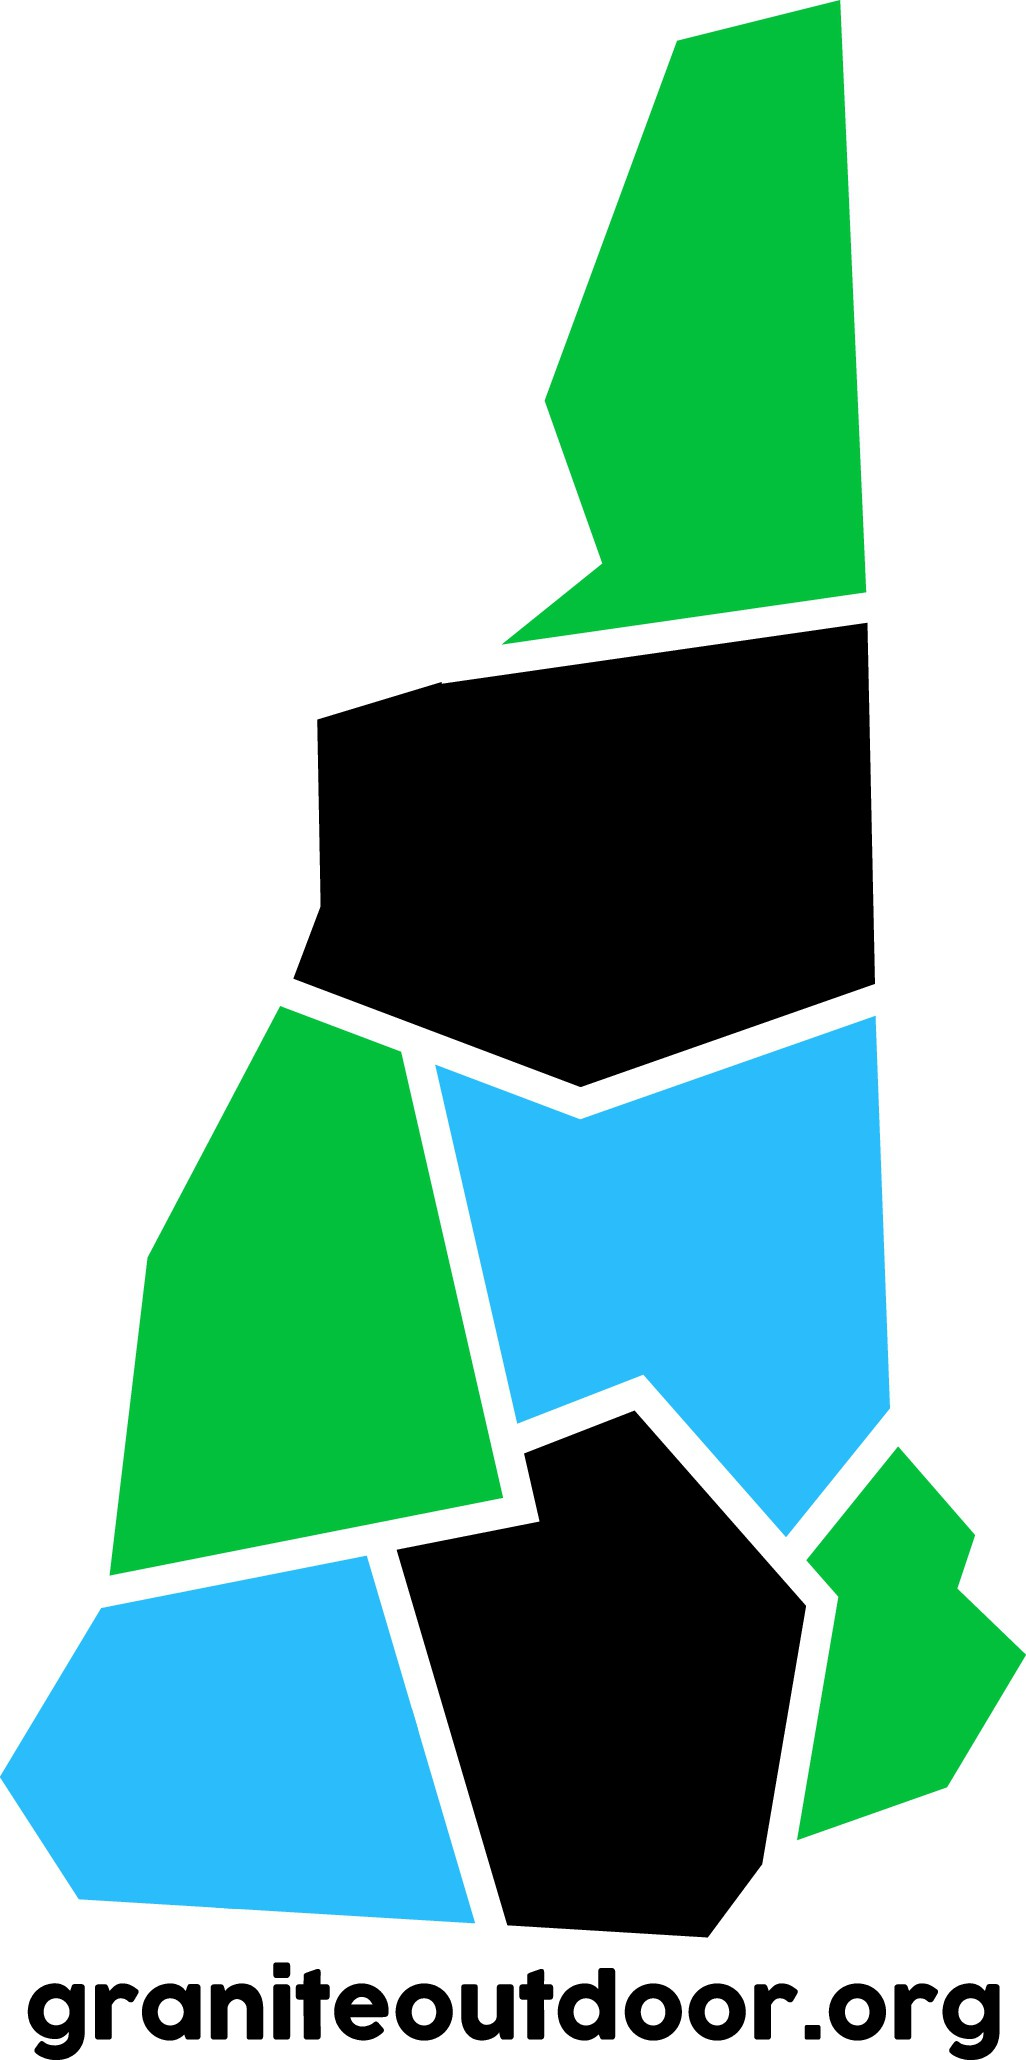 Granite Outdoor Alliance Logo